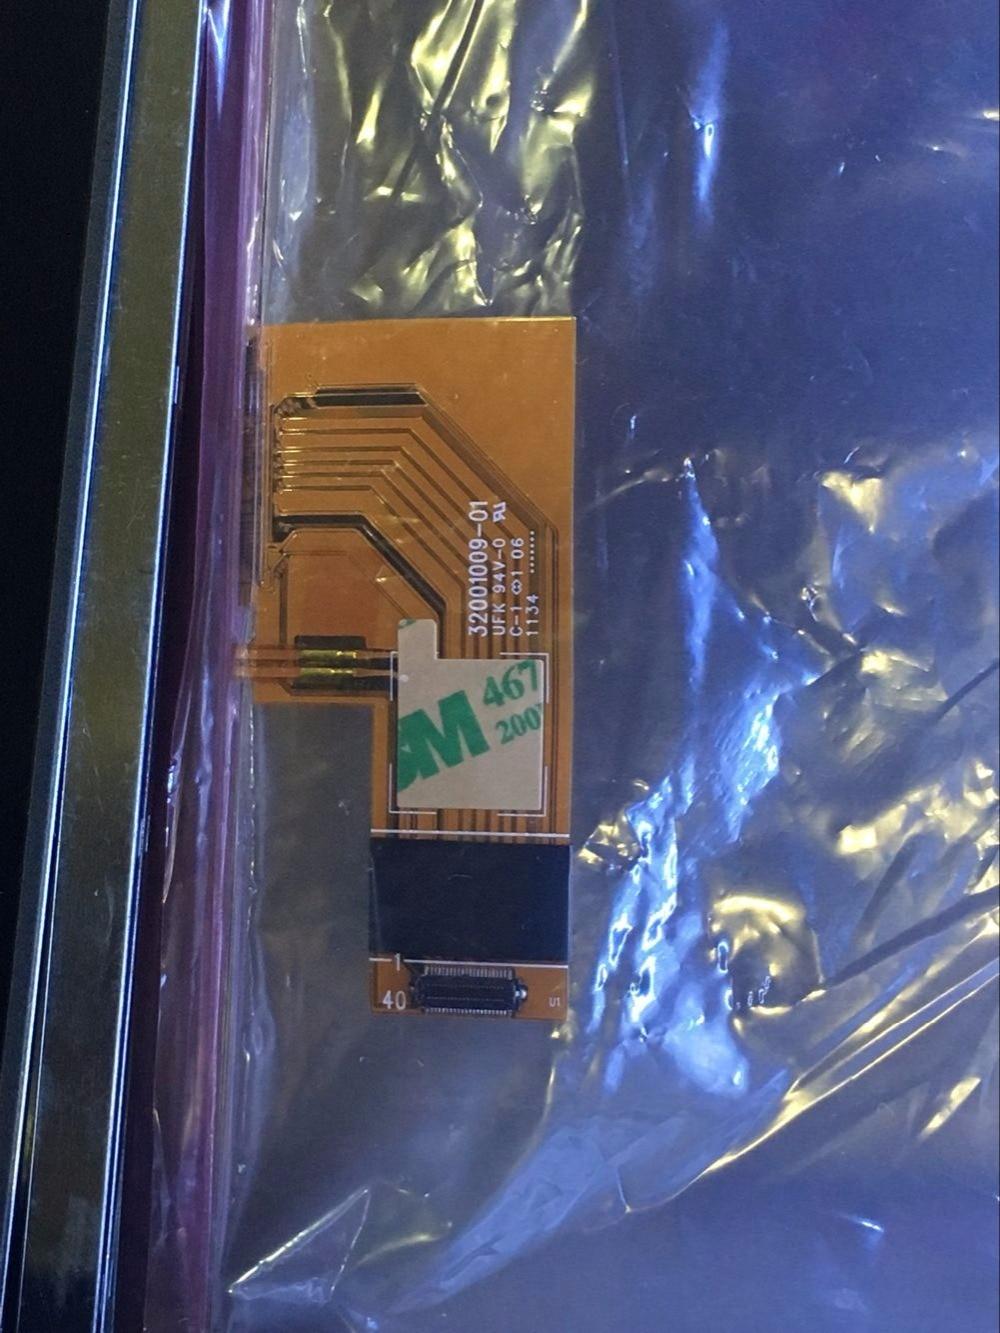 New 8 -inch LCD screen EJ080NA-04A 32001009-01 free shipping free shipping 10pcs stk730 080